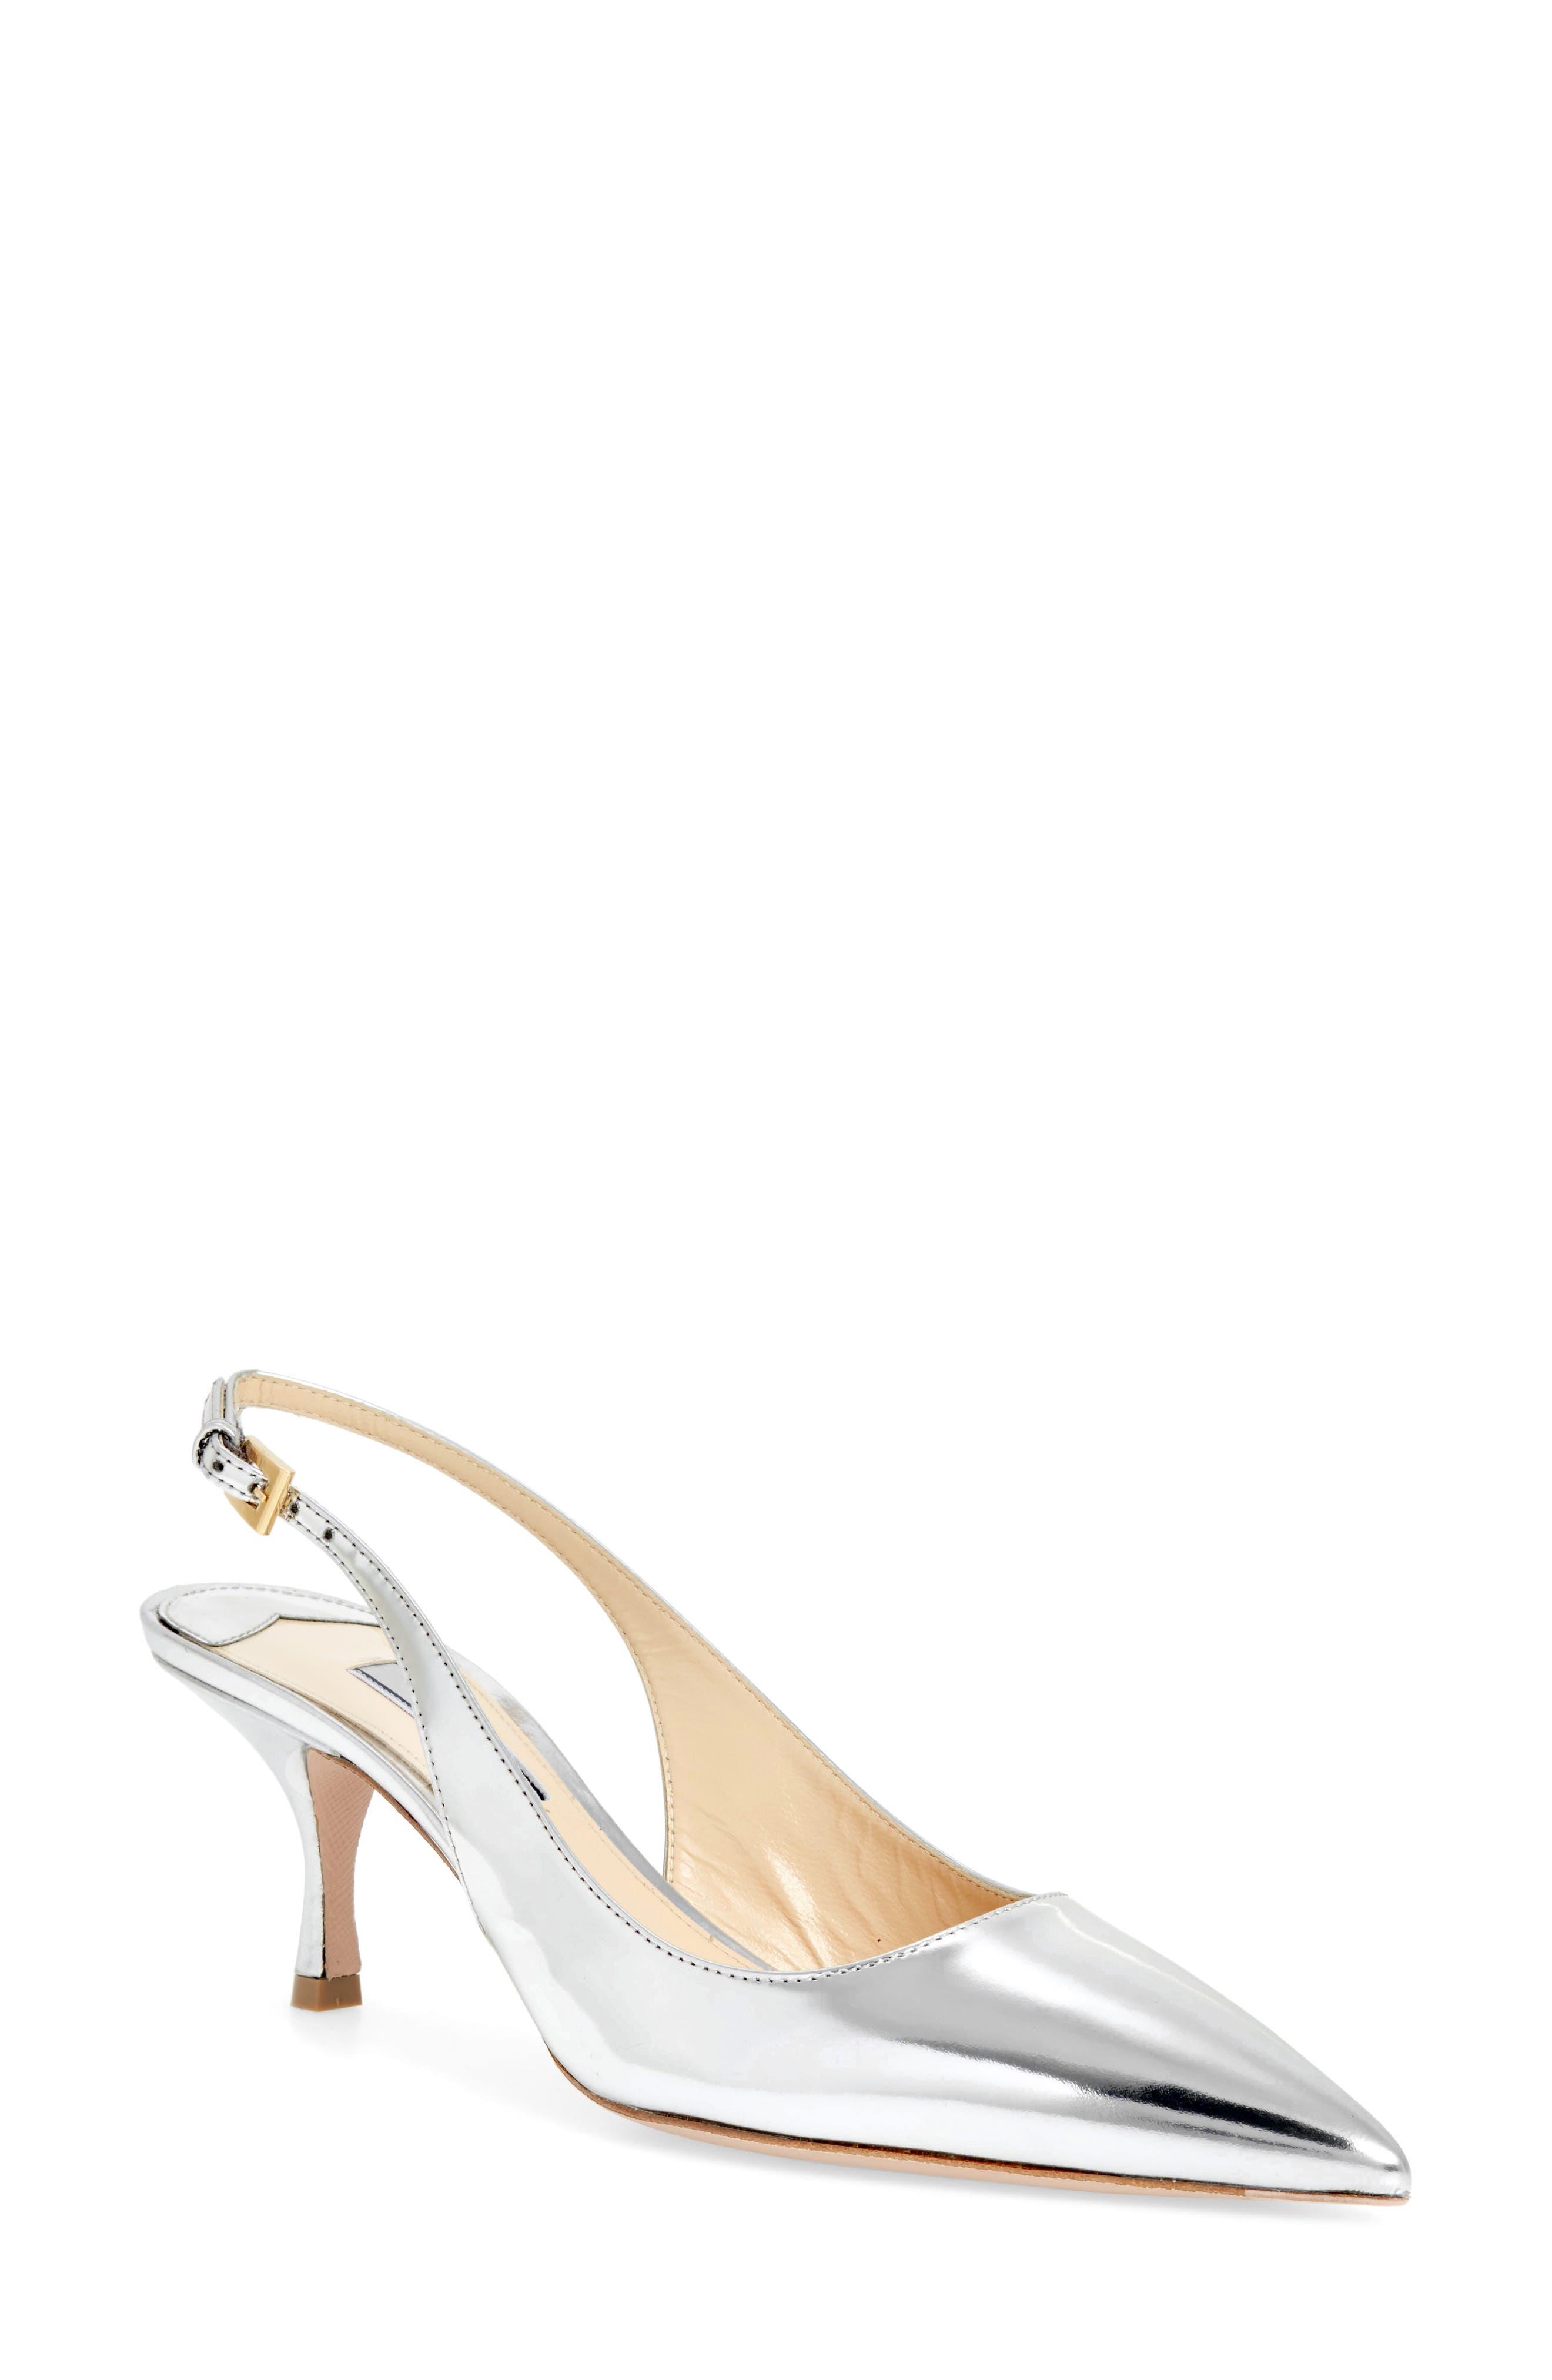 Main Image - Prada Pointy Toe Slingback Sandal (Women)